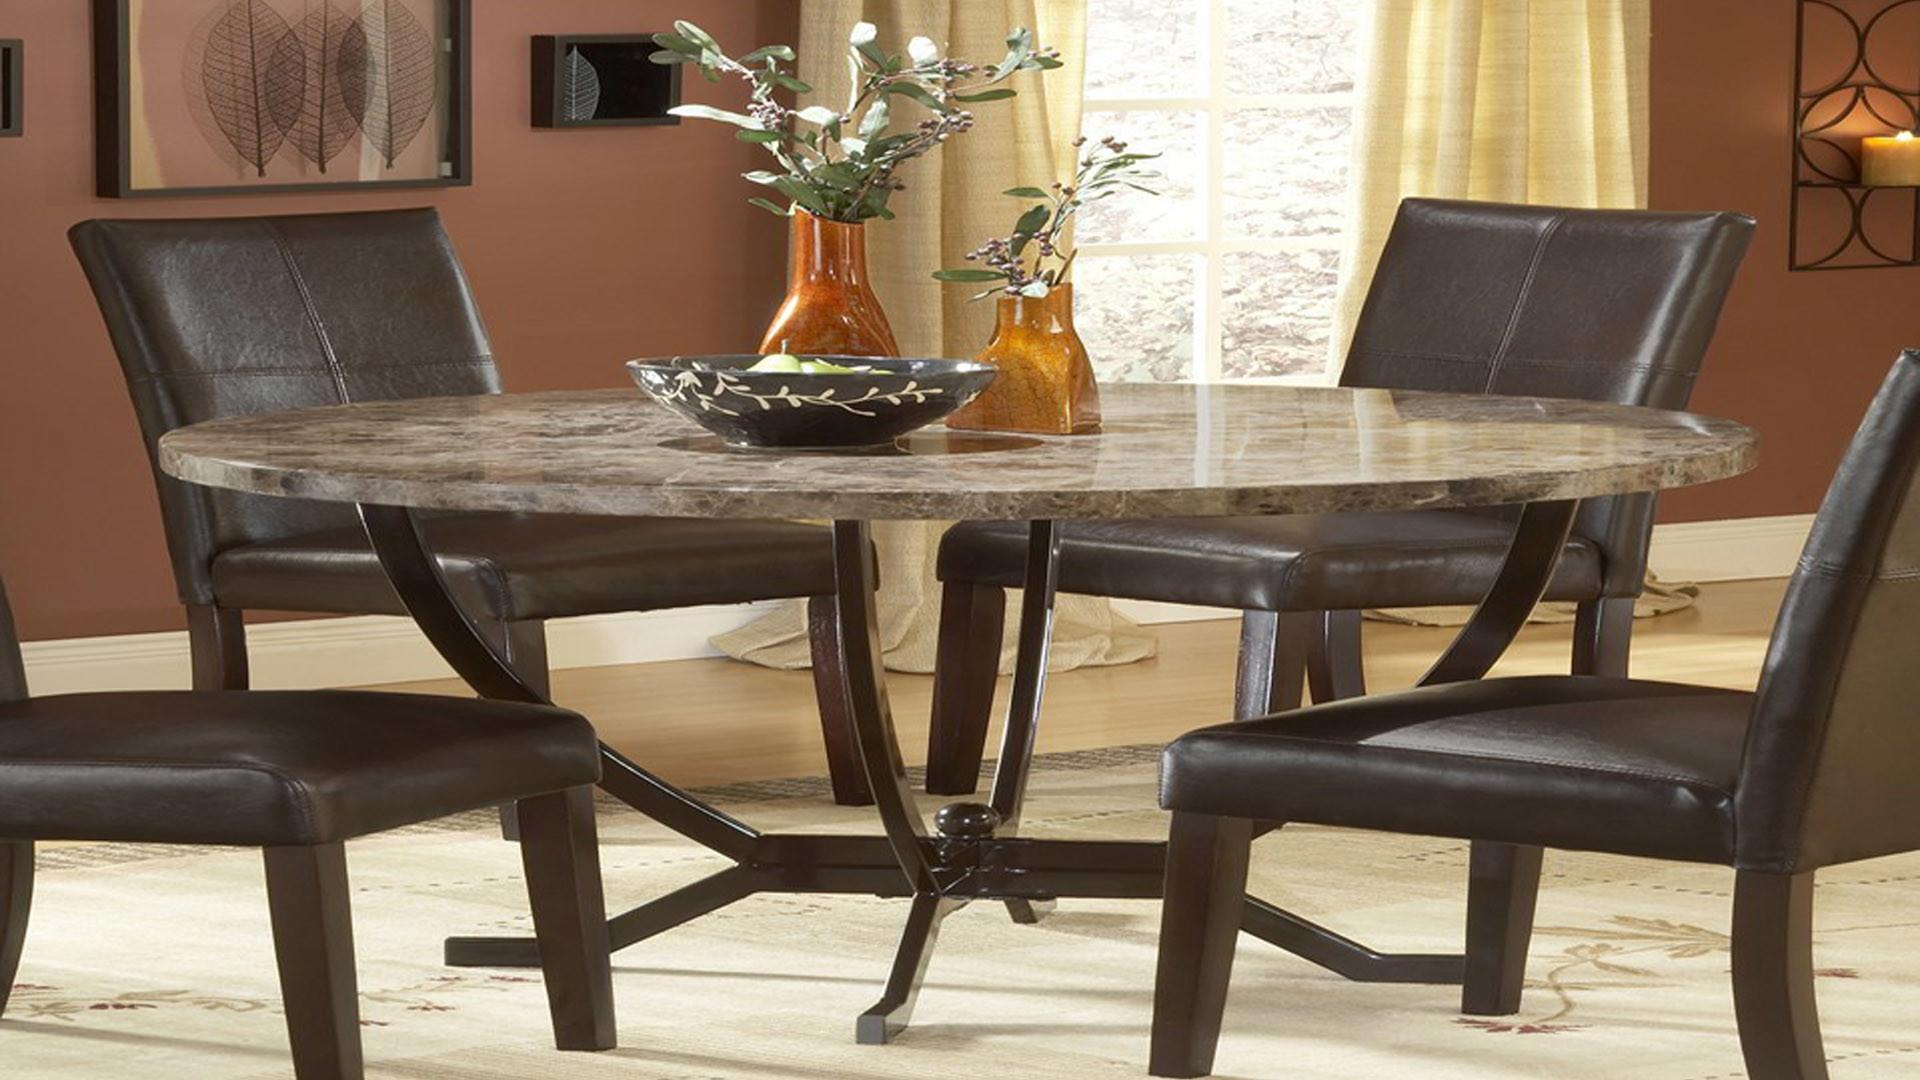 Formal Dining Room Table Centerpieces Ideas Modern Kitchen Decoratorist 50563